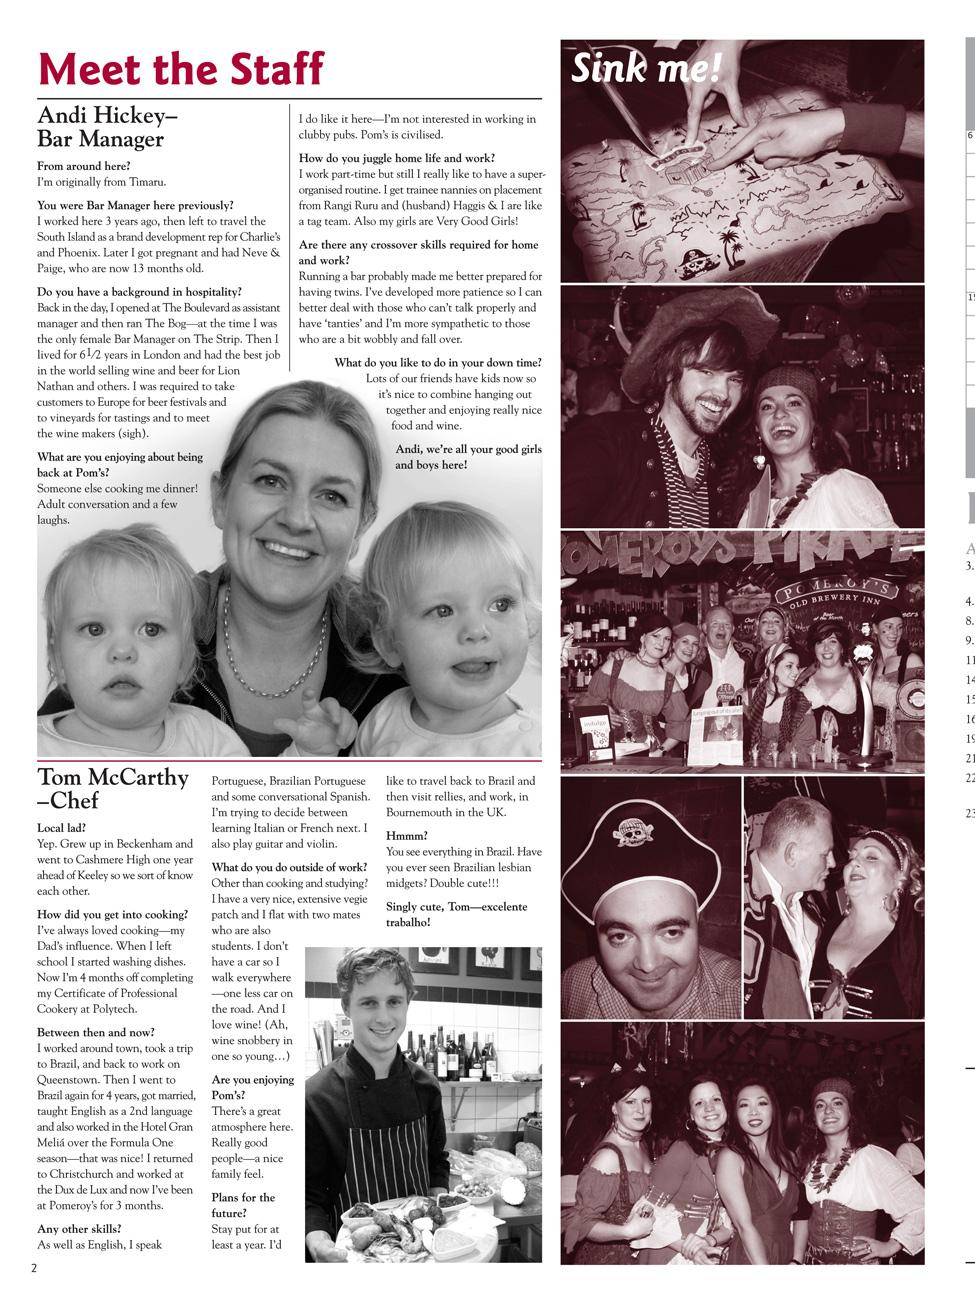 The Pomeroy's Press. Pom's staff profile article. Andi Hitchens, Tom McCarthy.